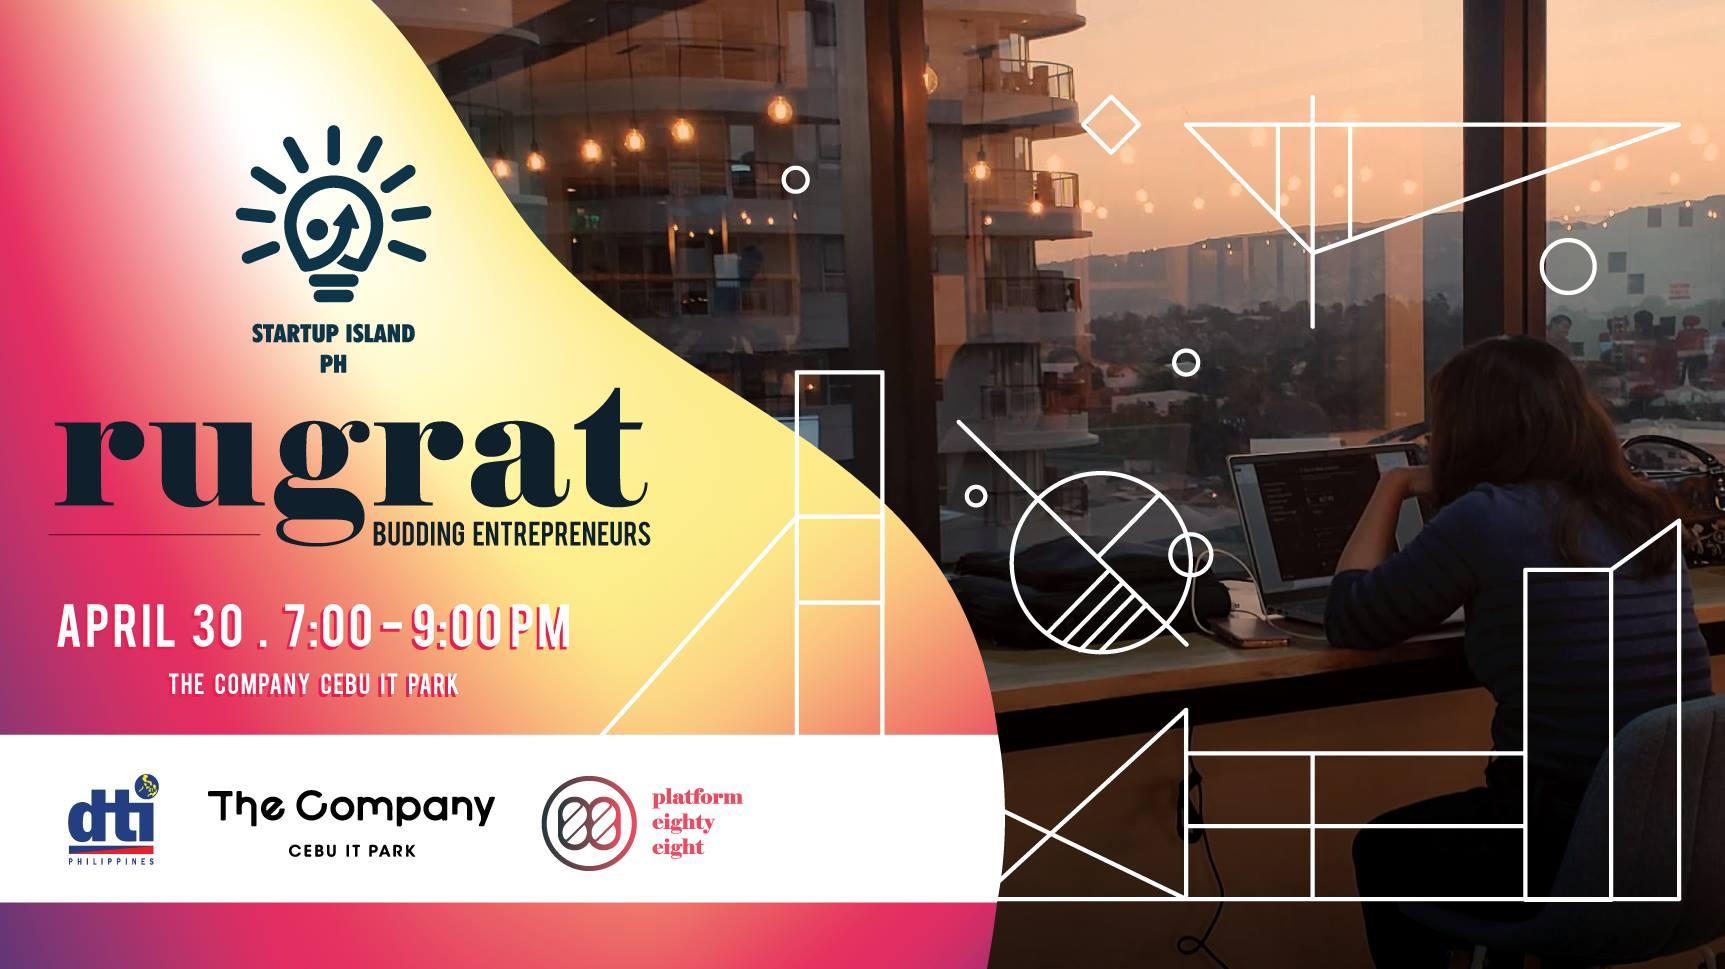 Rugrat: Budding Entrepreneurs Header